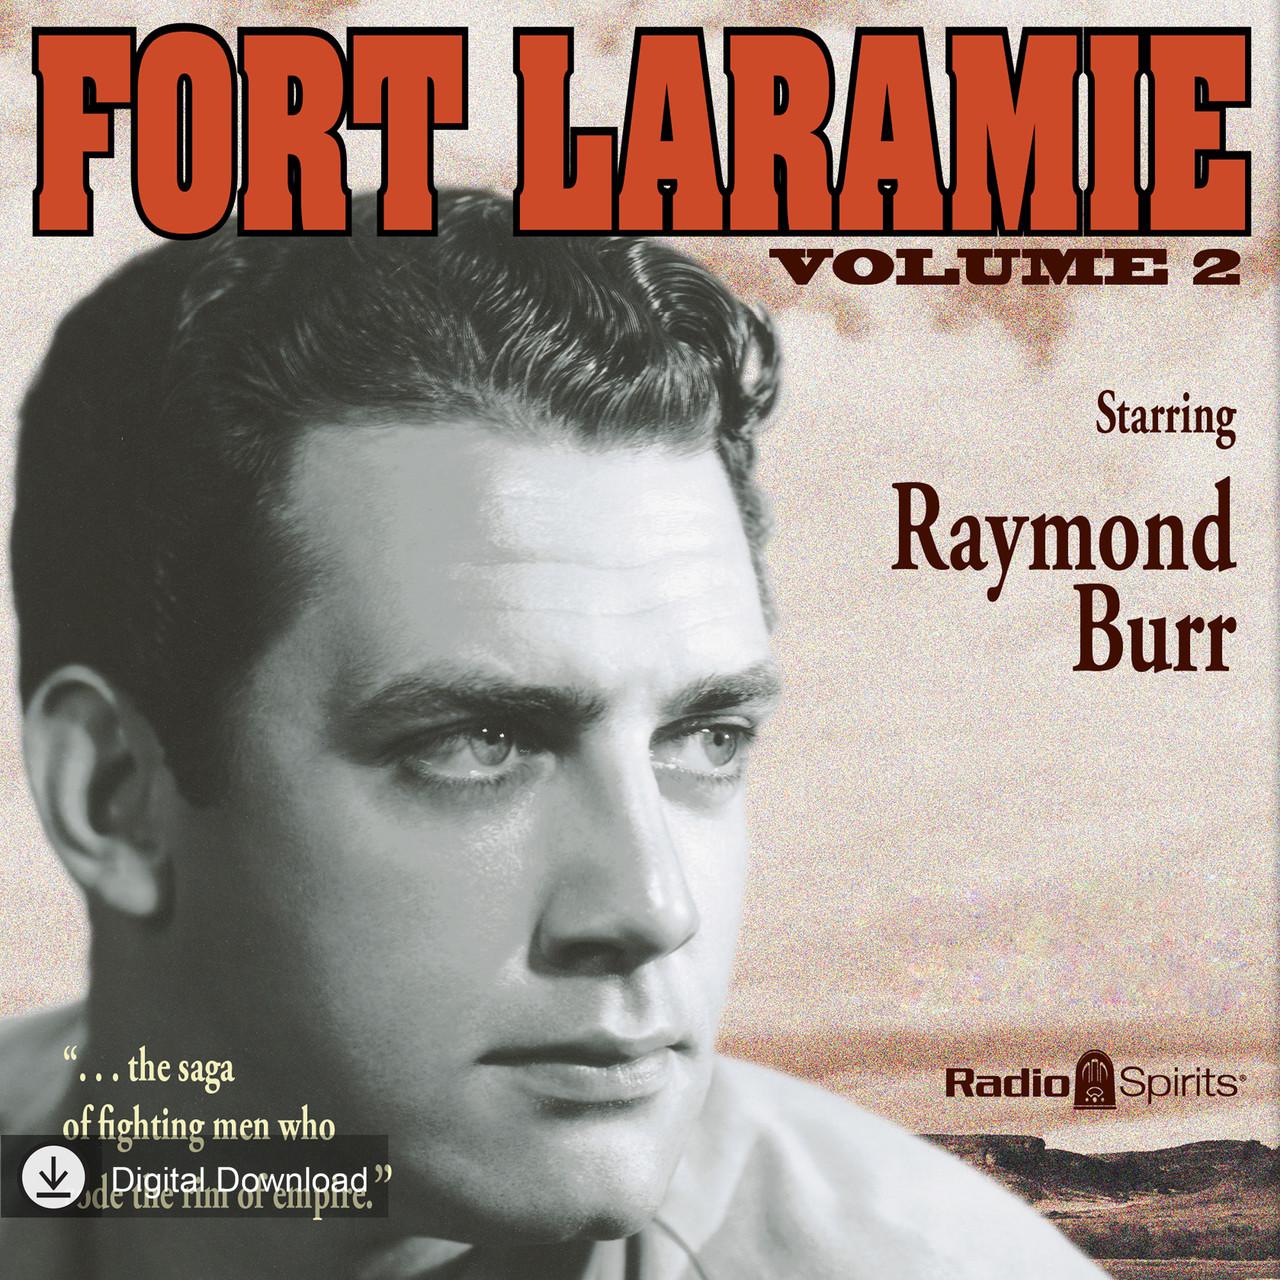 Fort Laramie: Volume Two (MP3 Download)